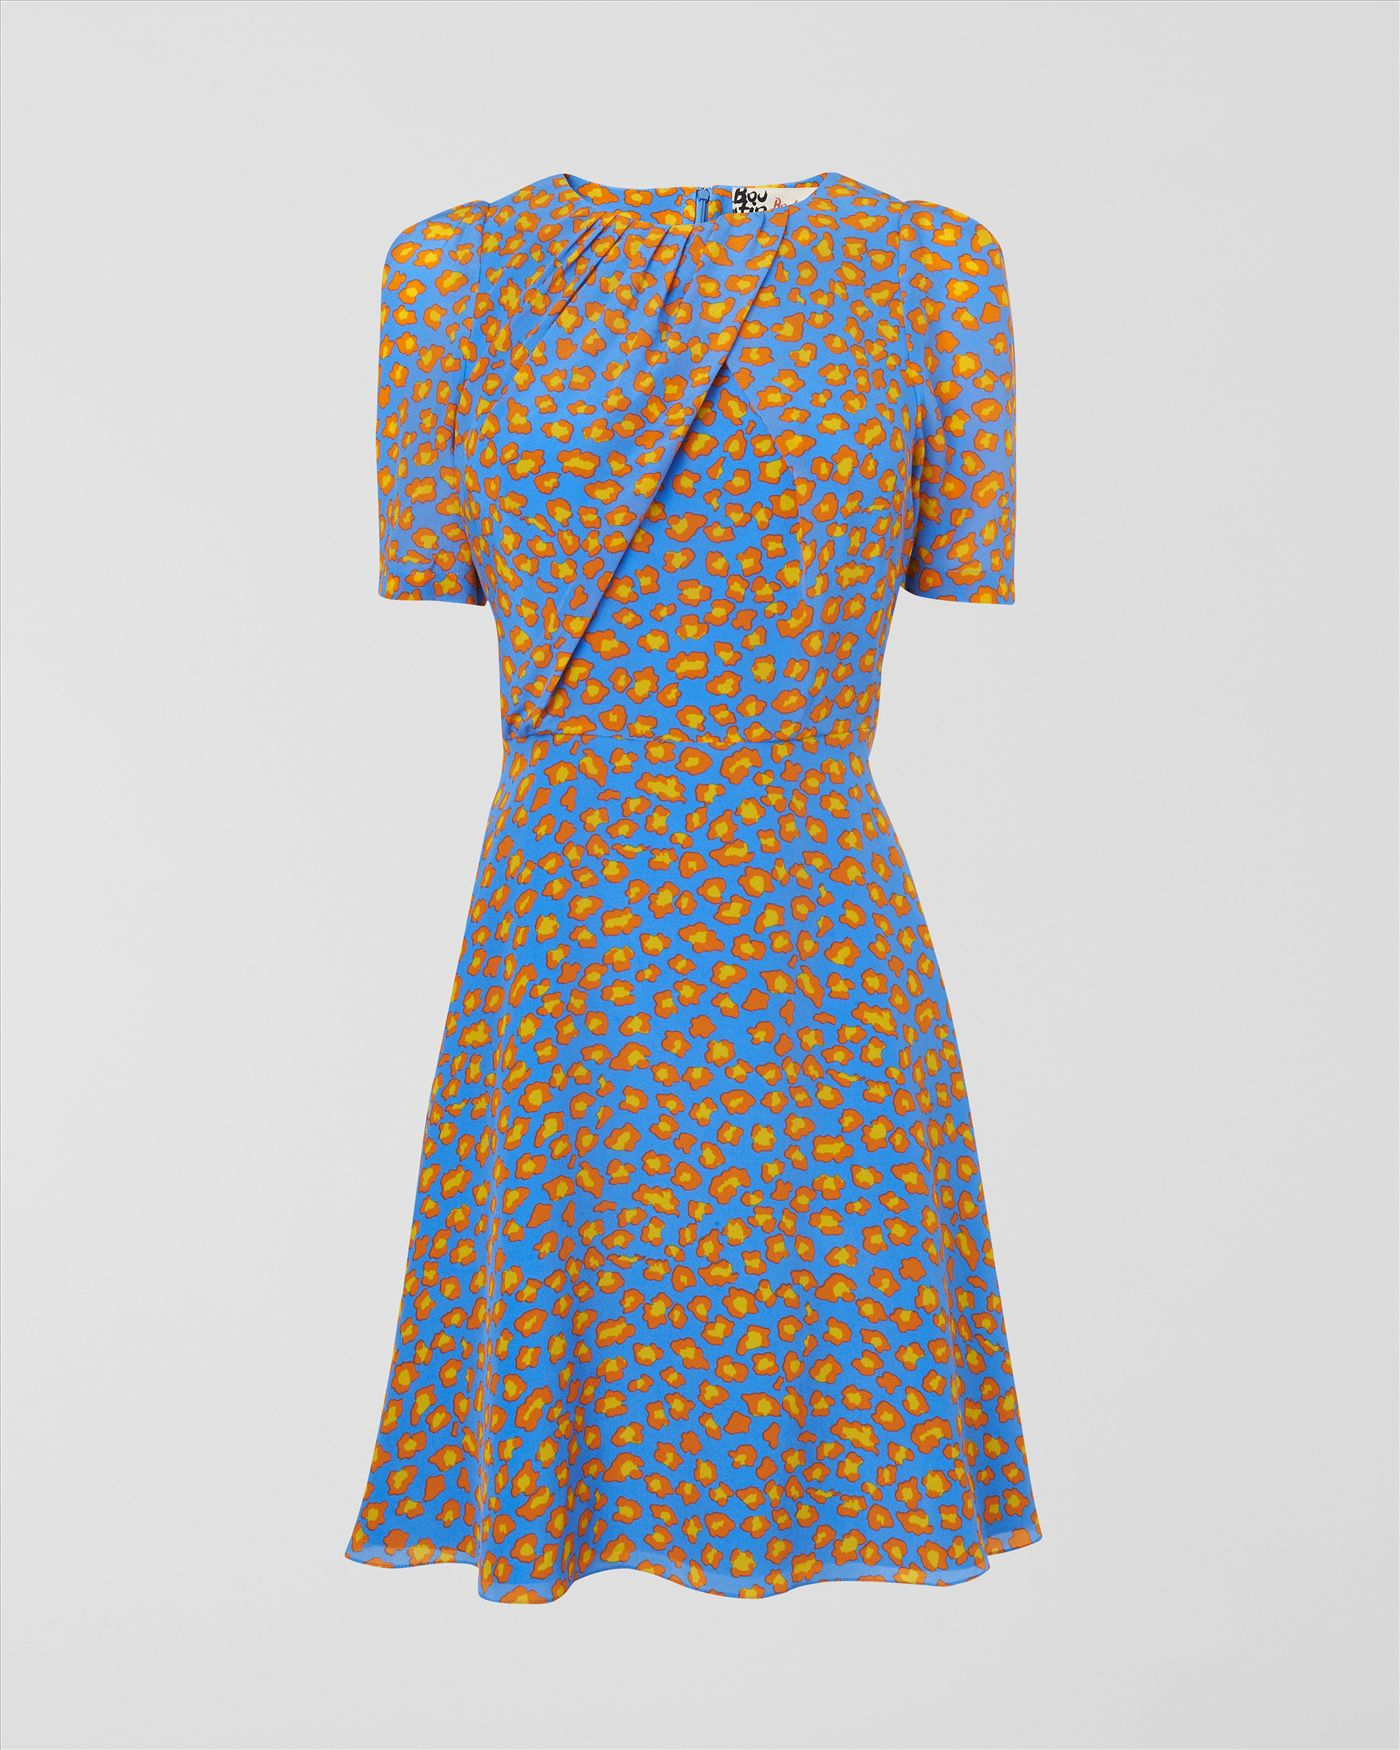 Lyst - Jaeger Leopard Print Silk Tea Dress in Blue 3eed7aed7